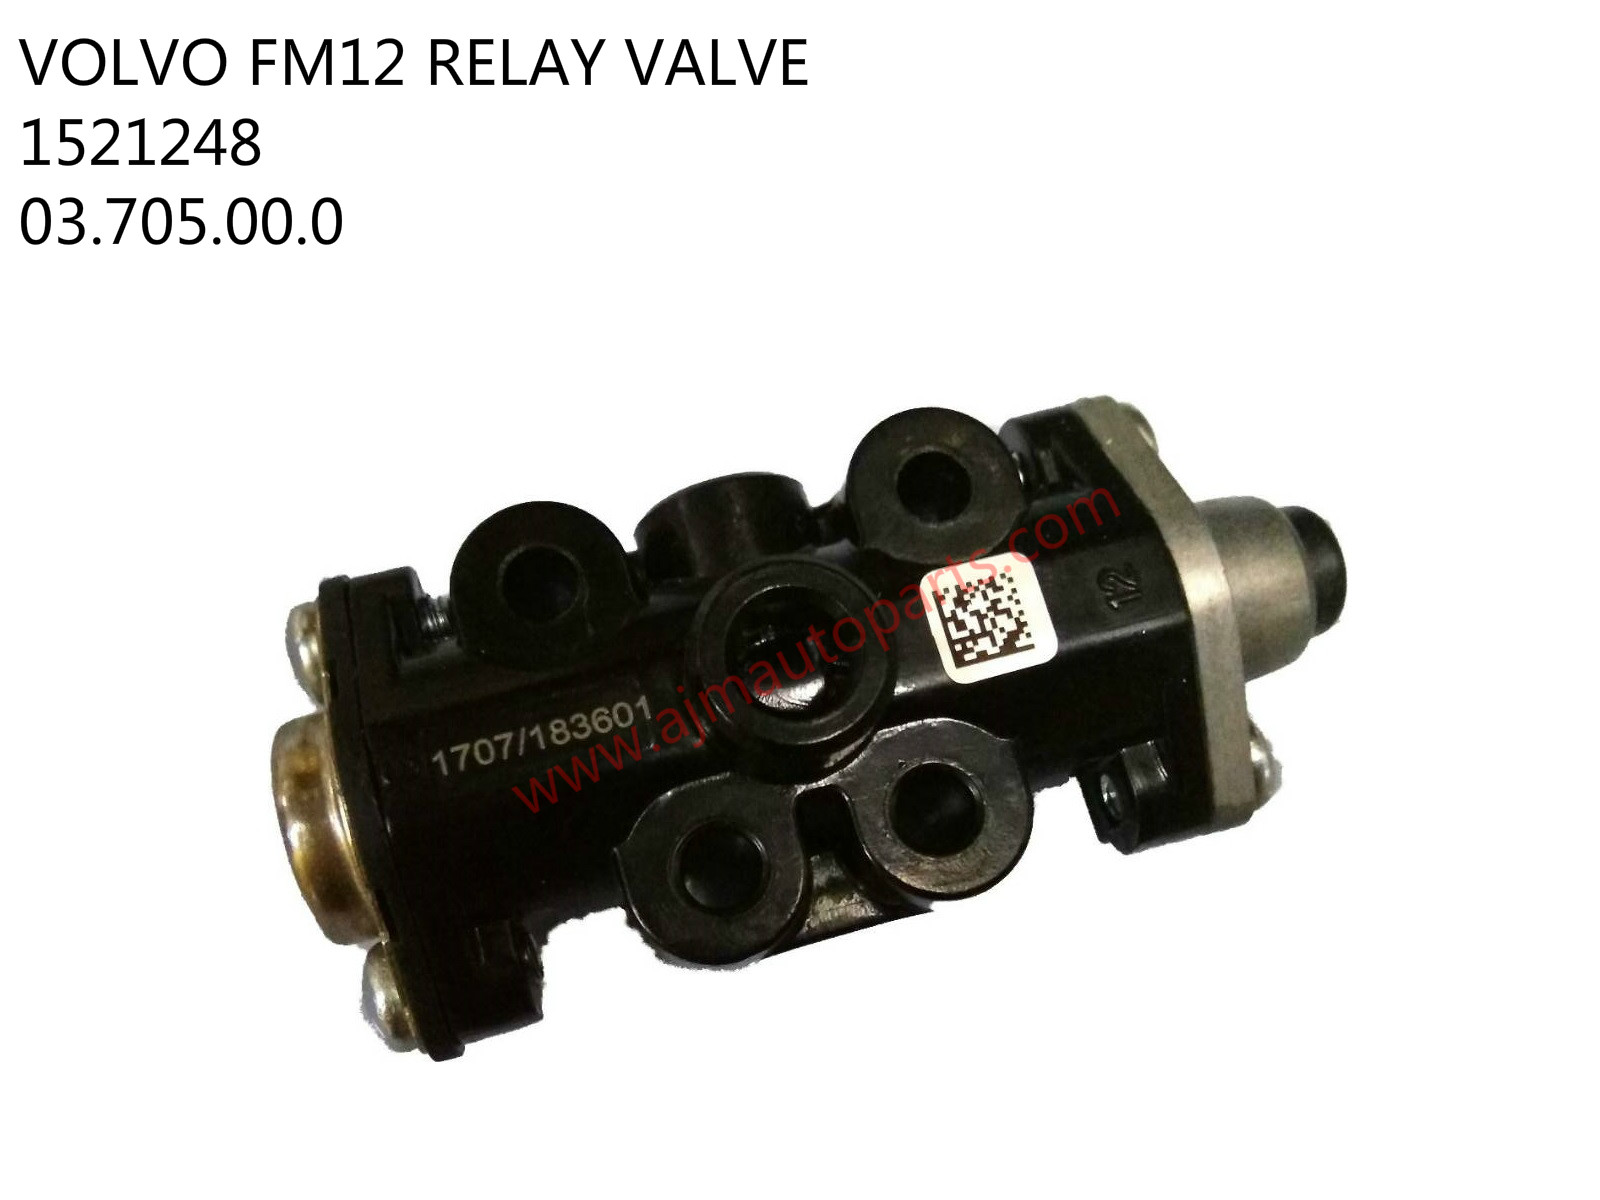 VOLVO FM12 RELAY VALVE-1521248